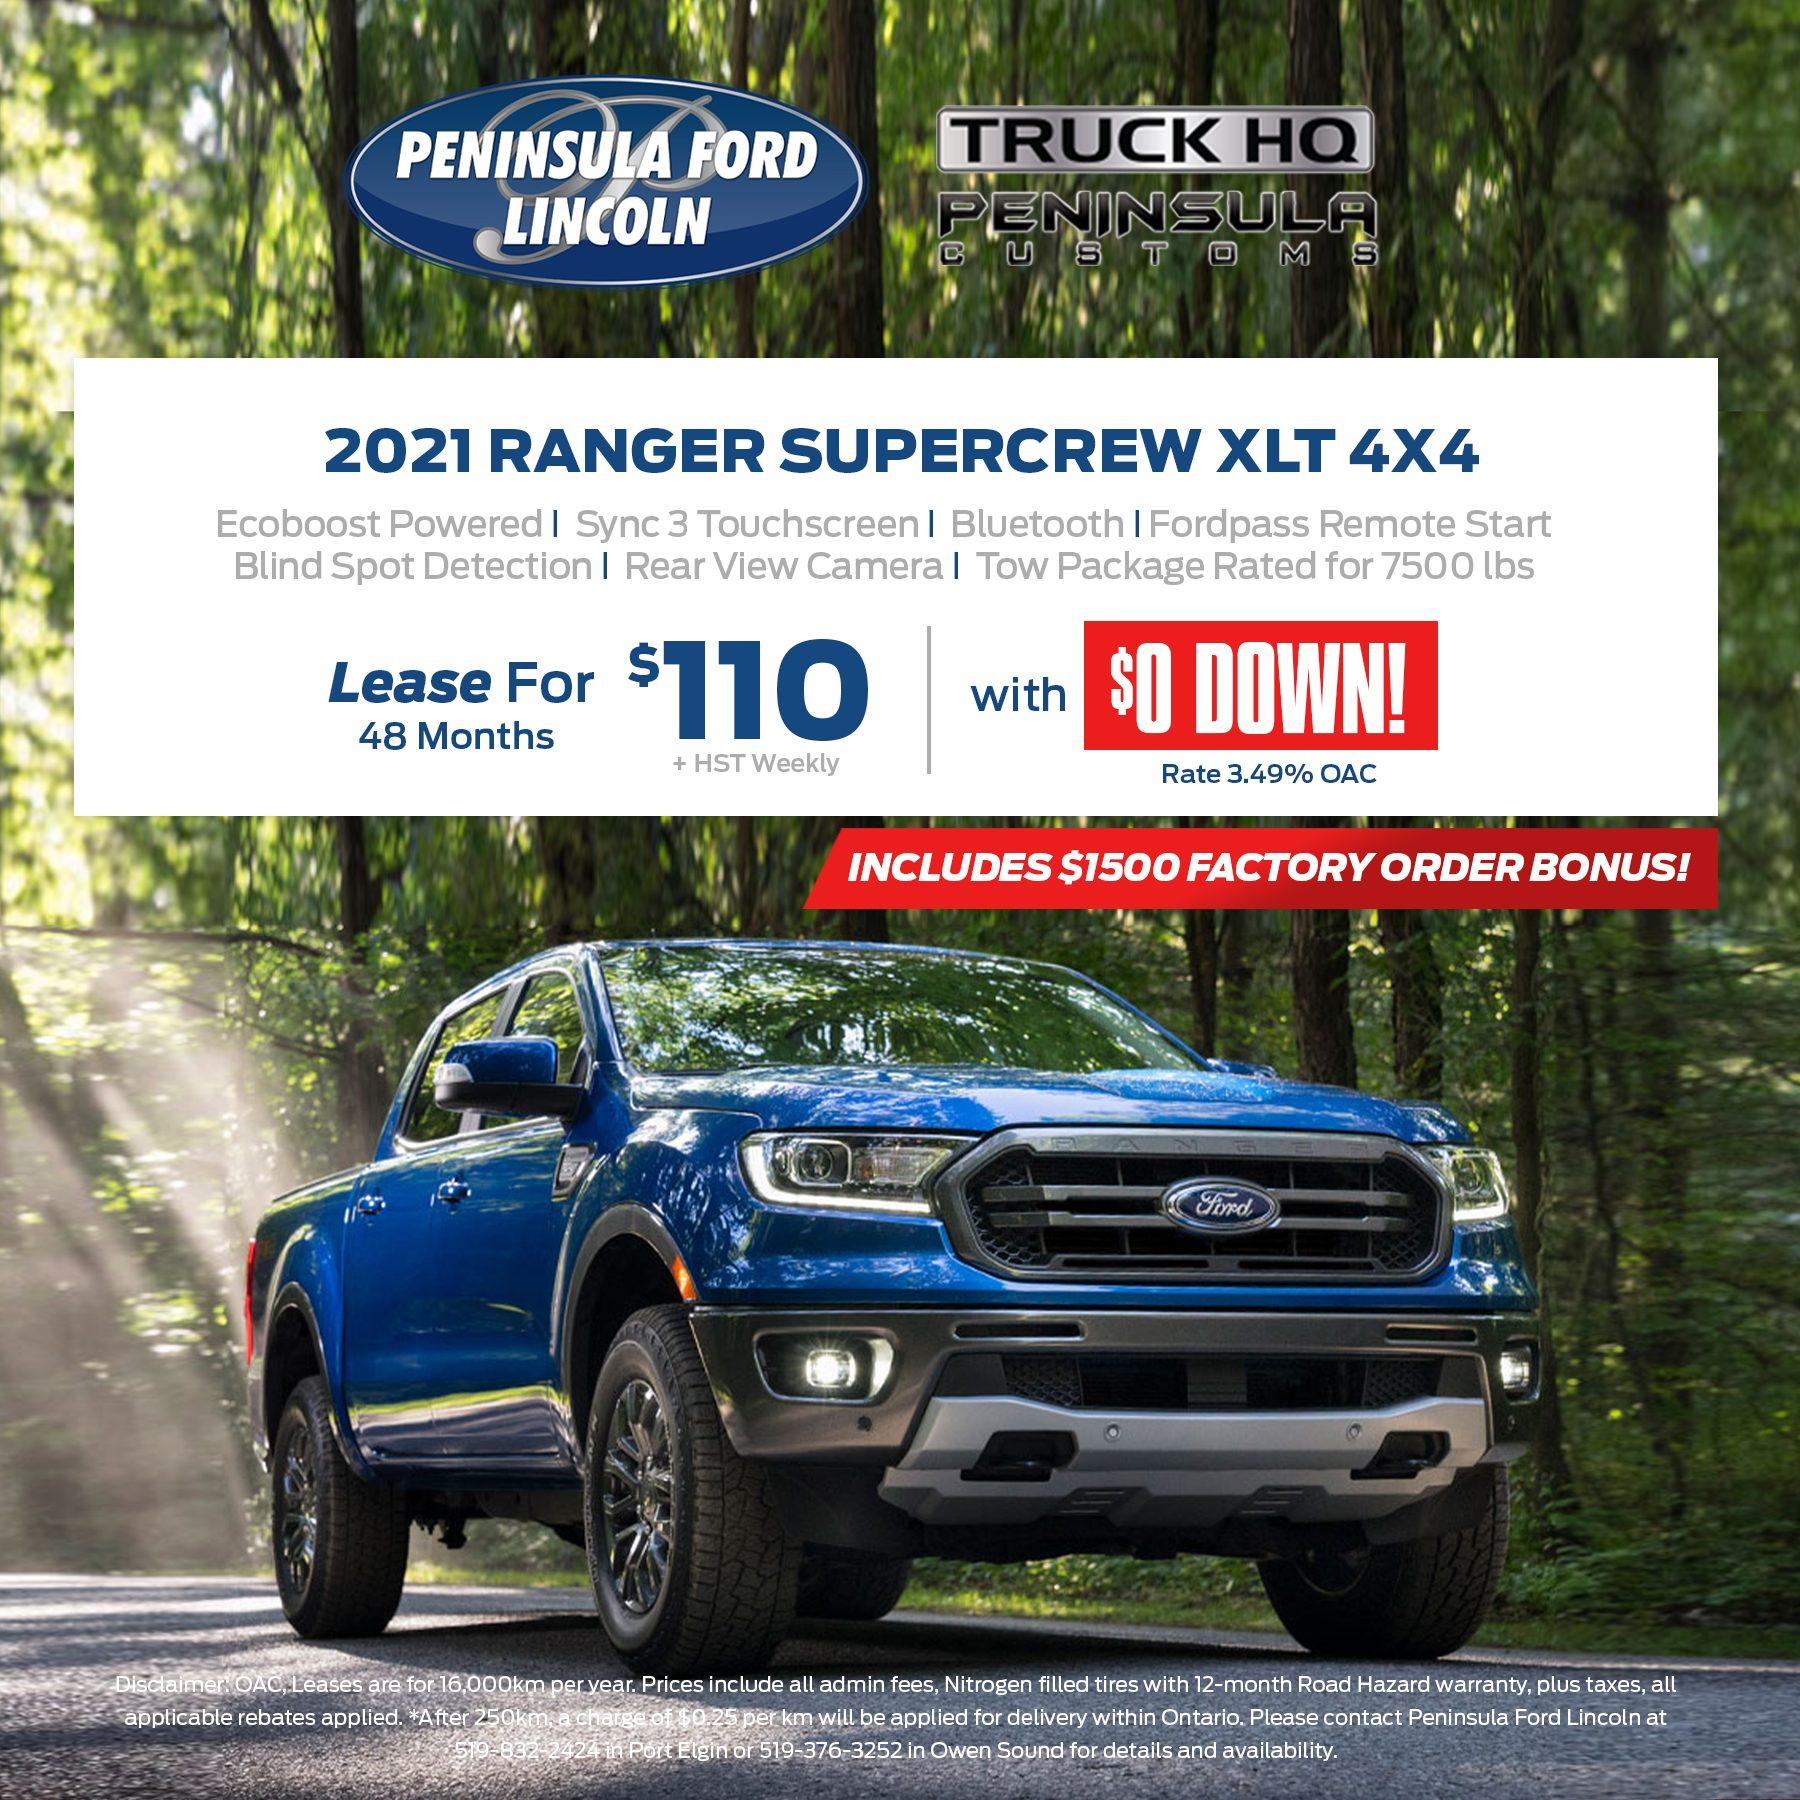 2021 Ranger Super Crew XLT 4X4